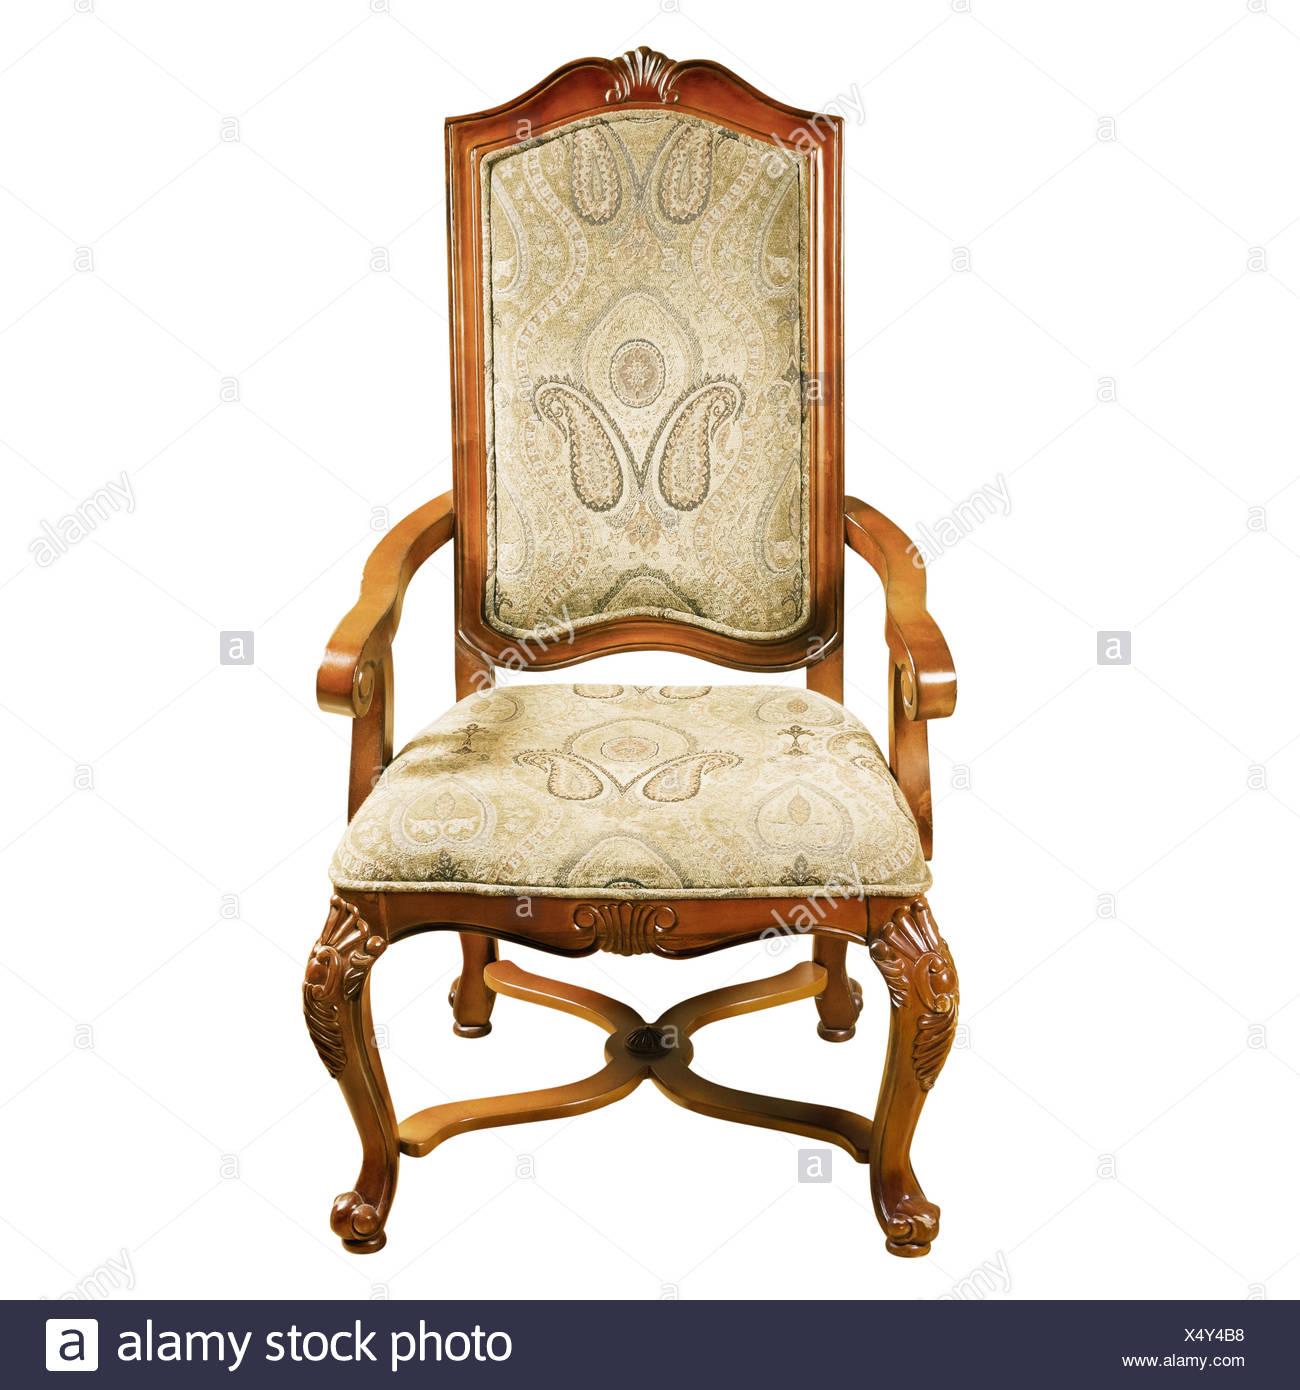 armchair object single - Stock Image